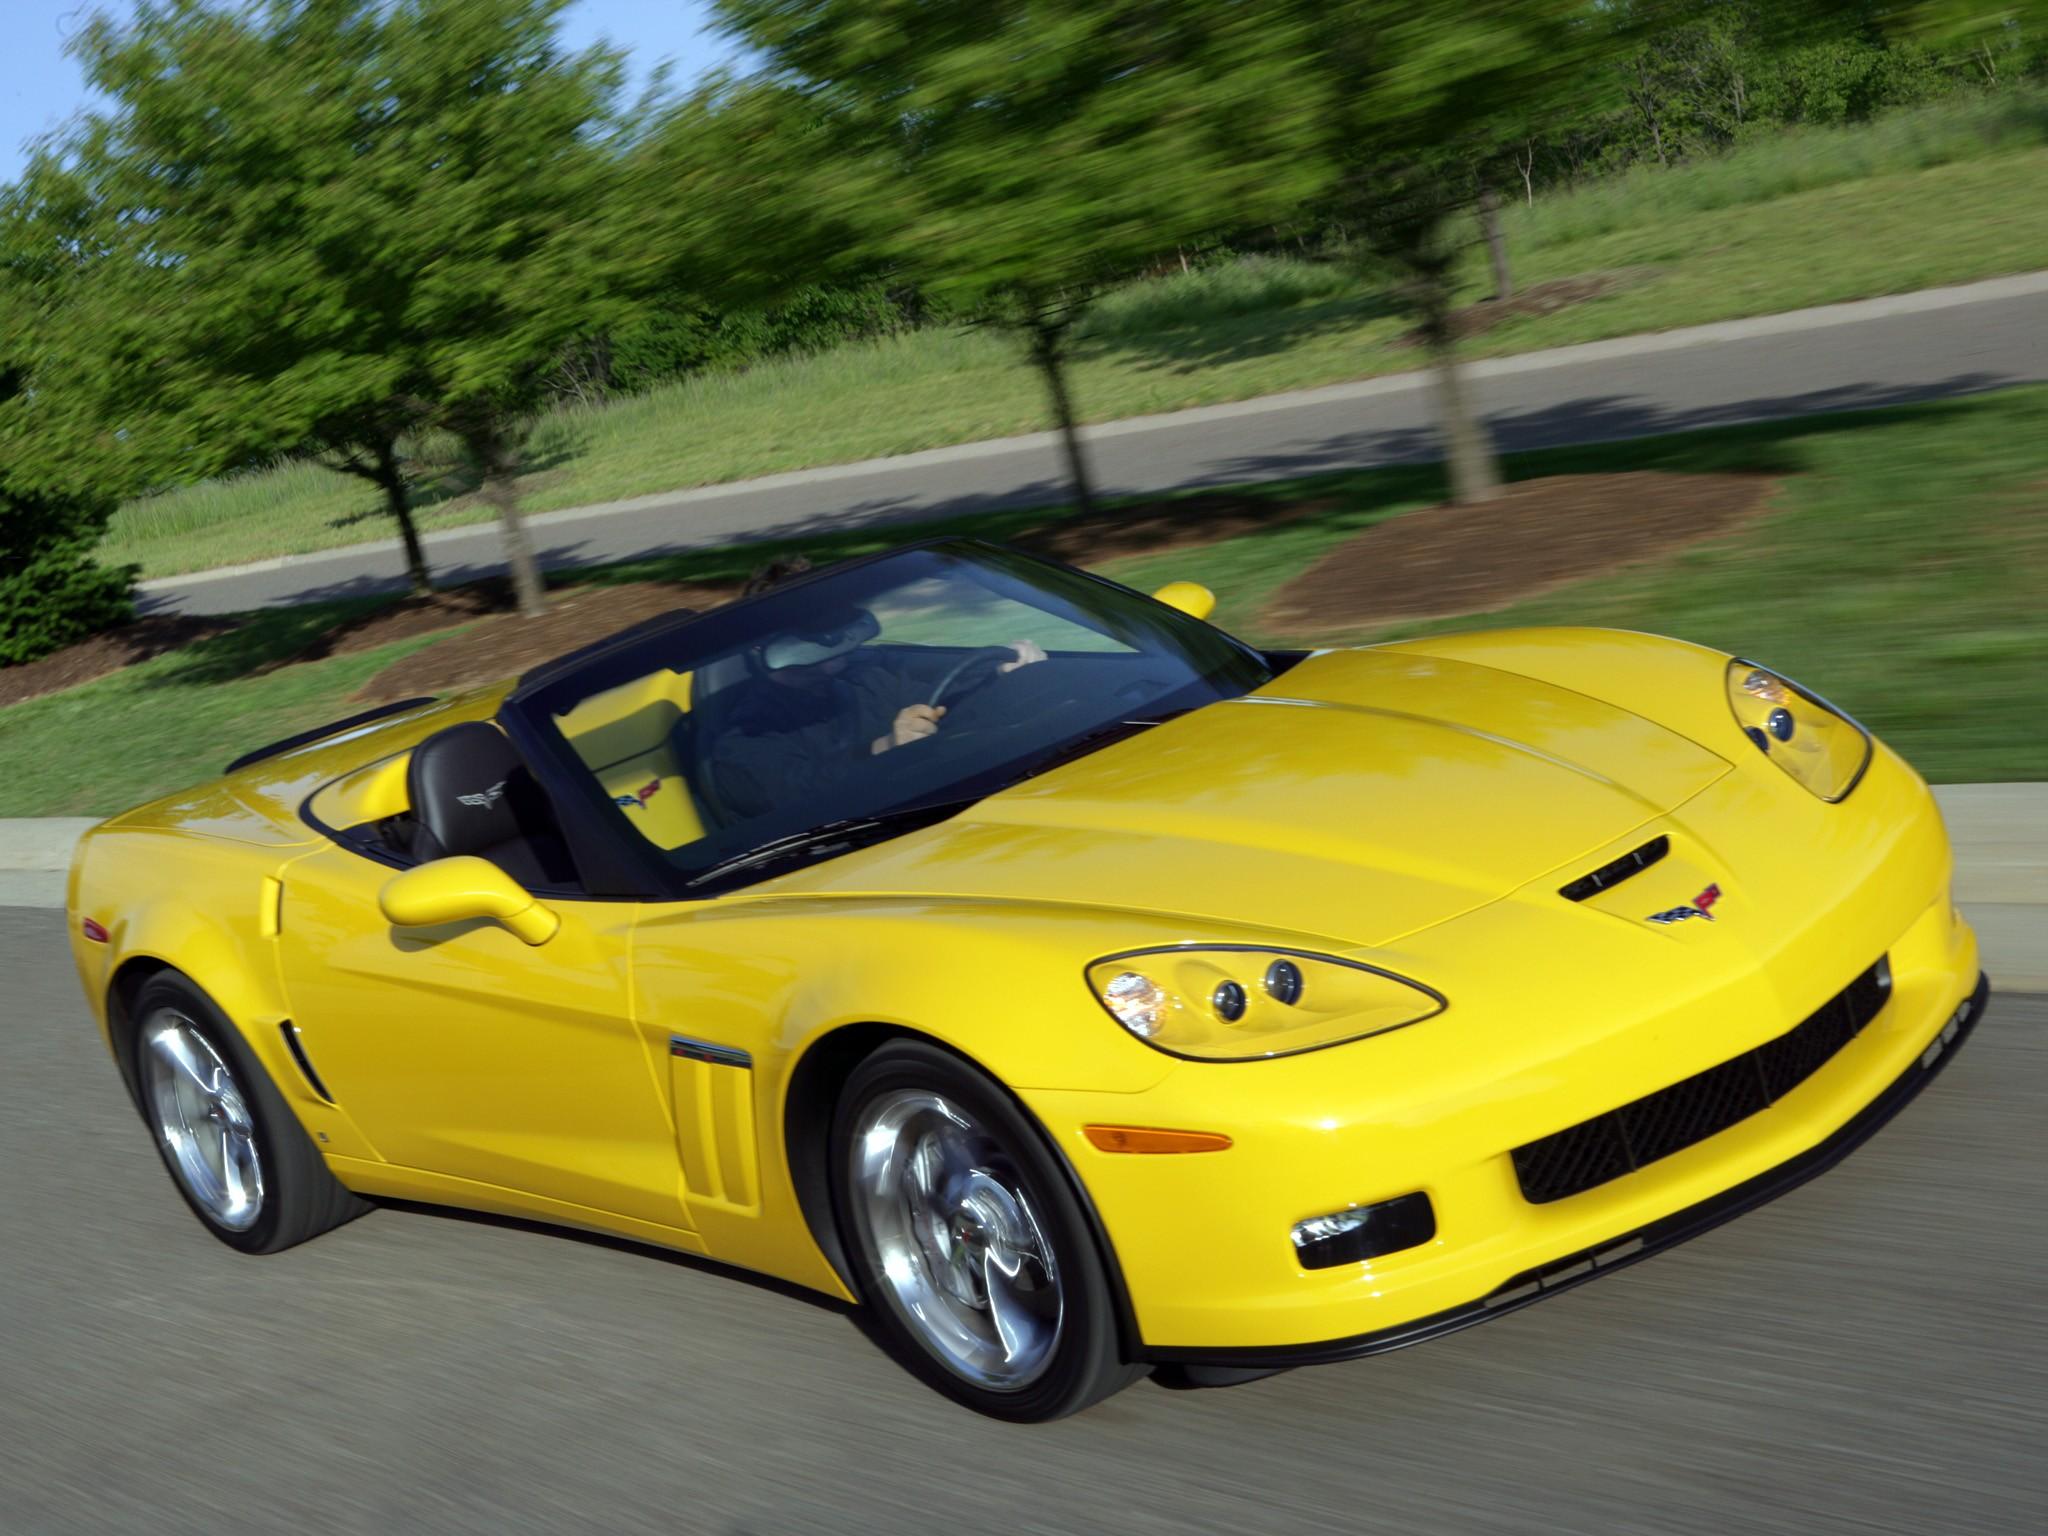 Chevrolet Corvette Convertible Grand Sport Specs Amp Photos 2009 2010 2011 2012 2013